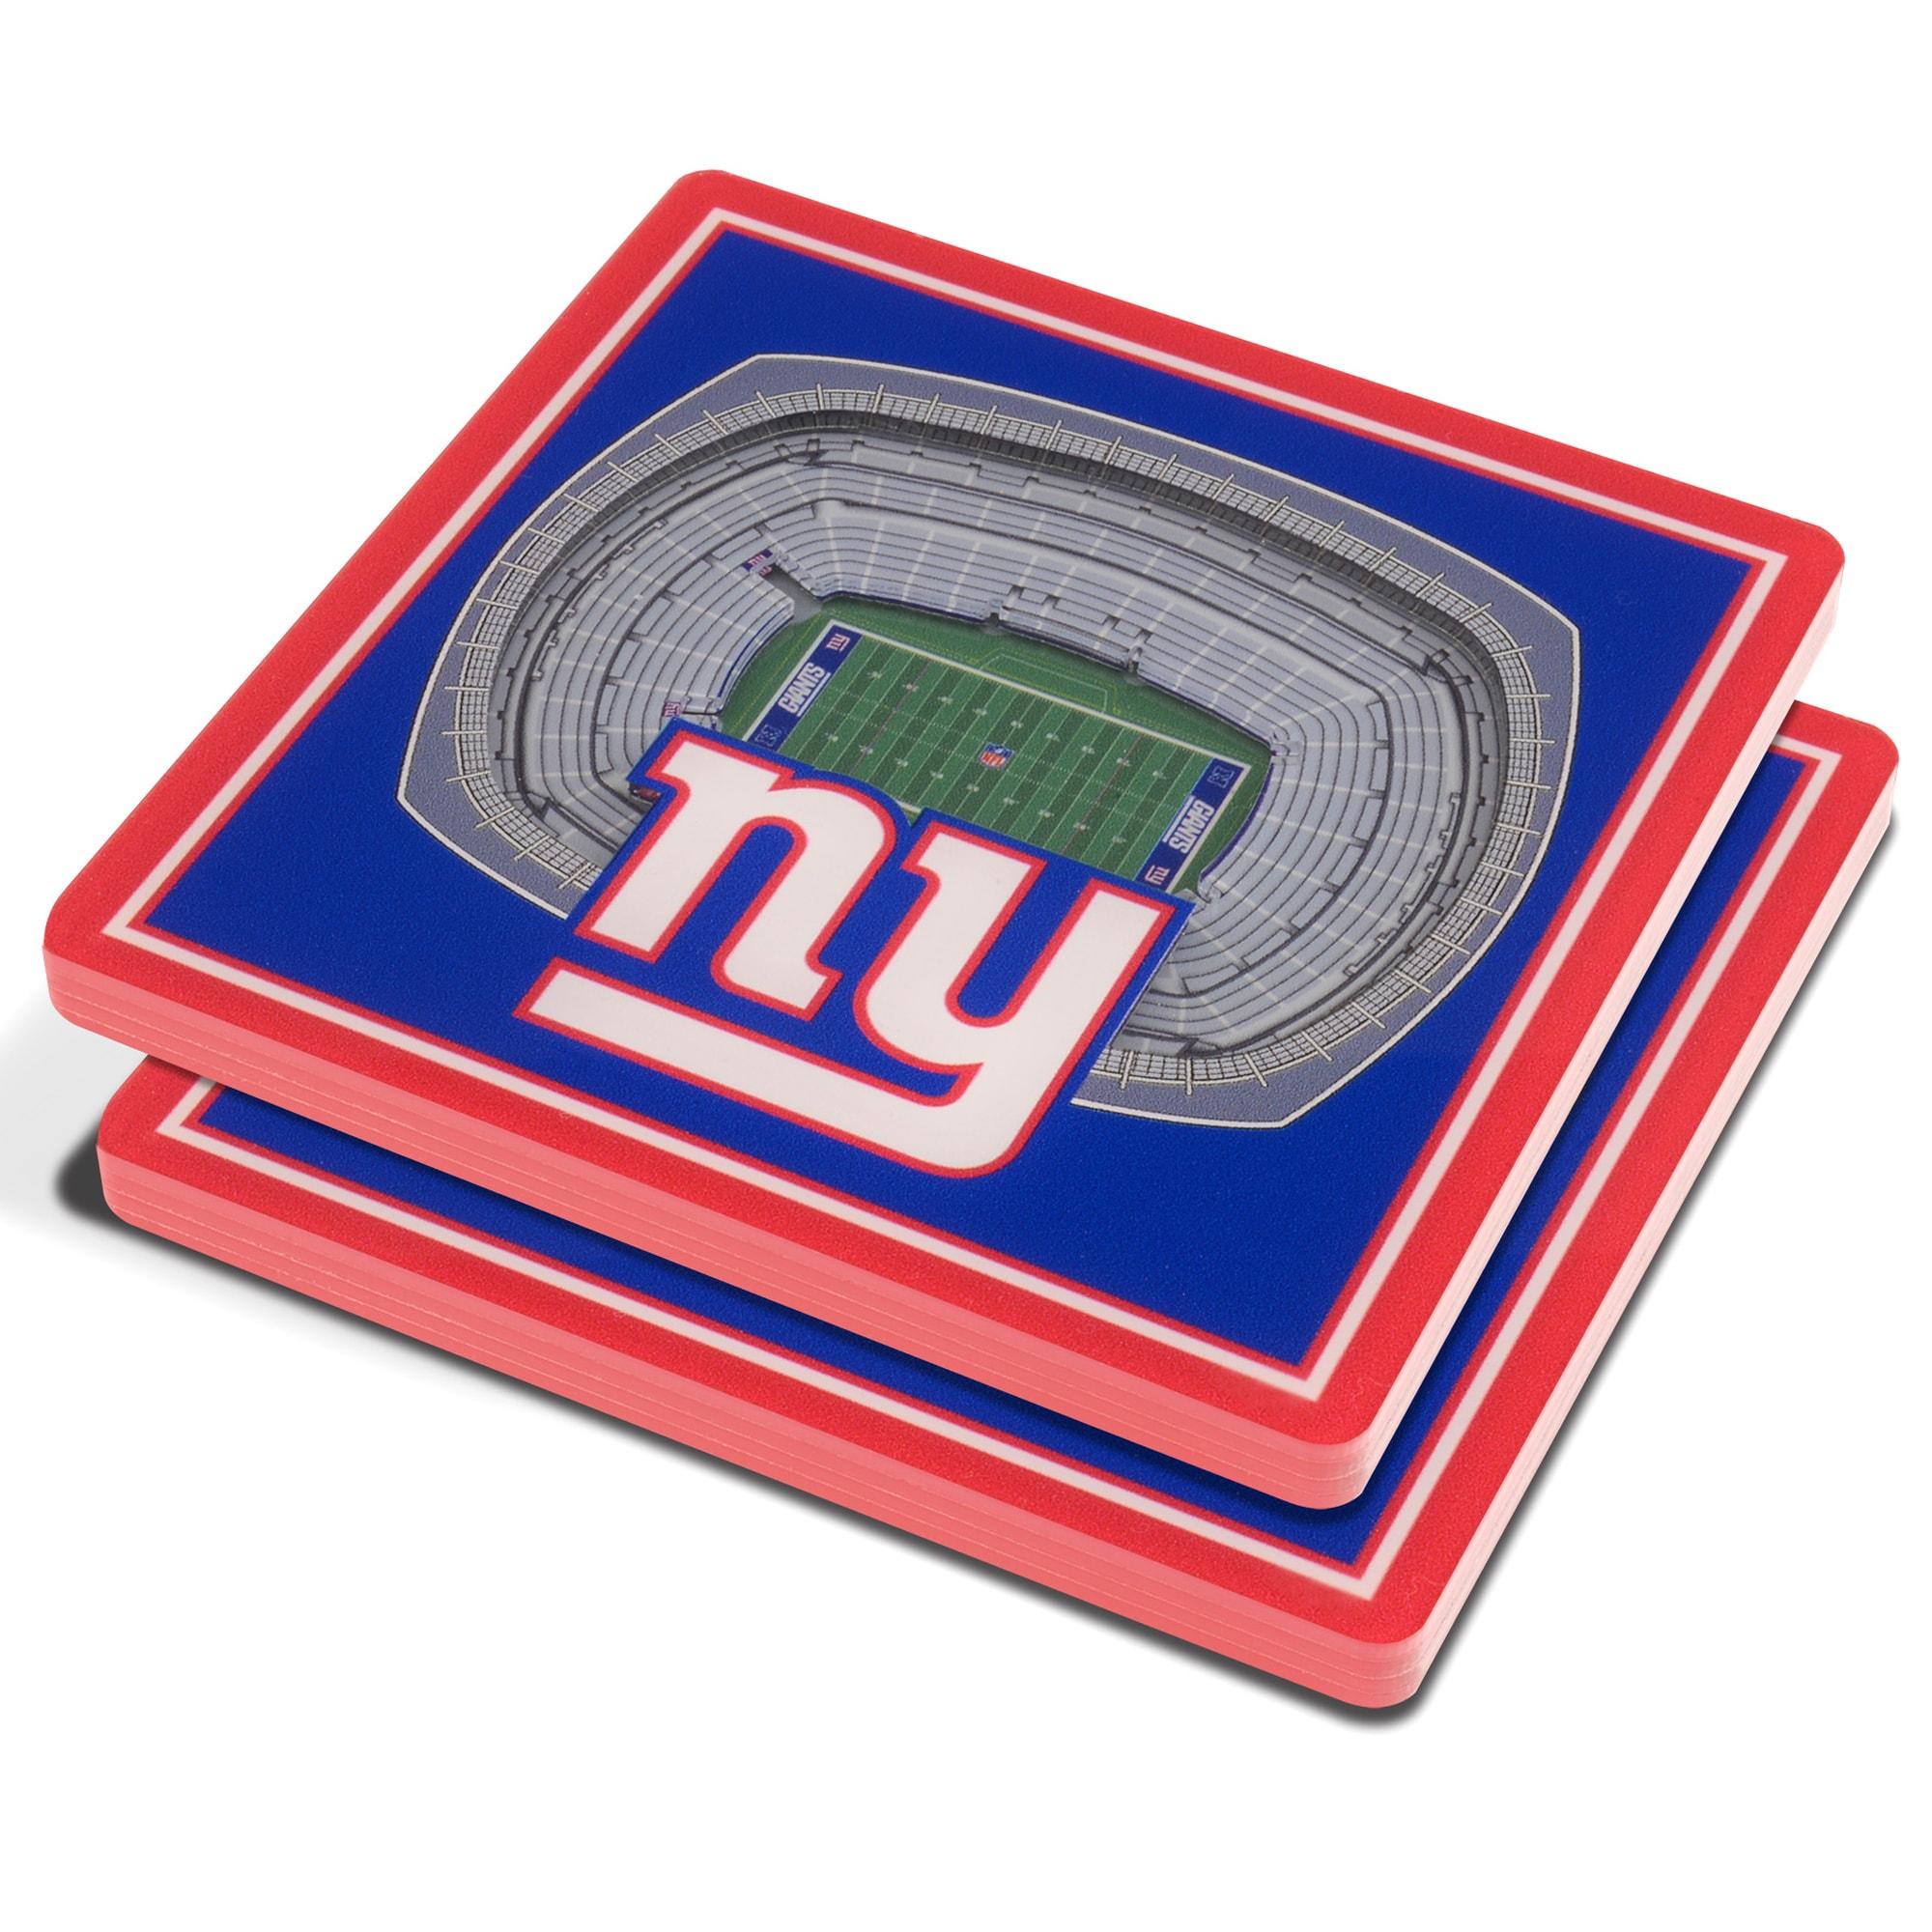 New York Giants 3D StadiumViews Coasters - Blue